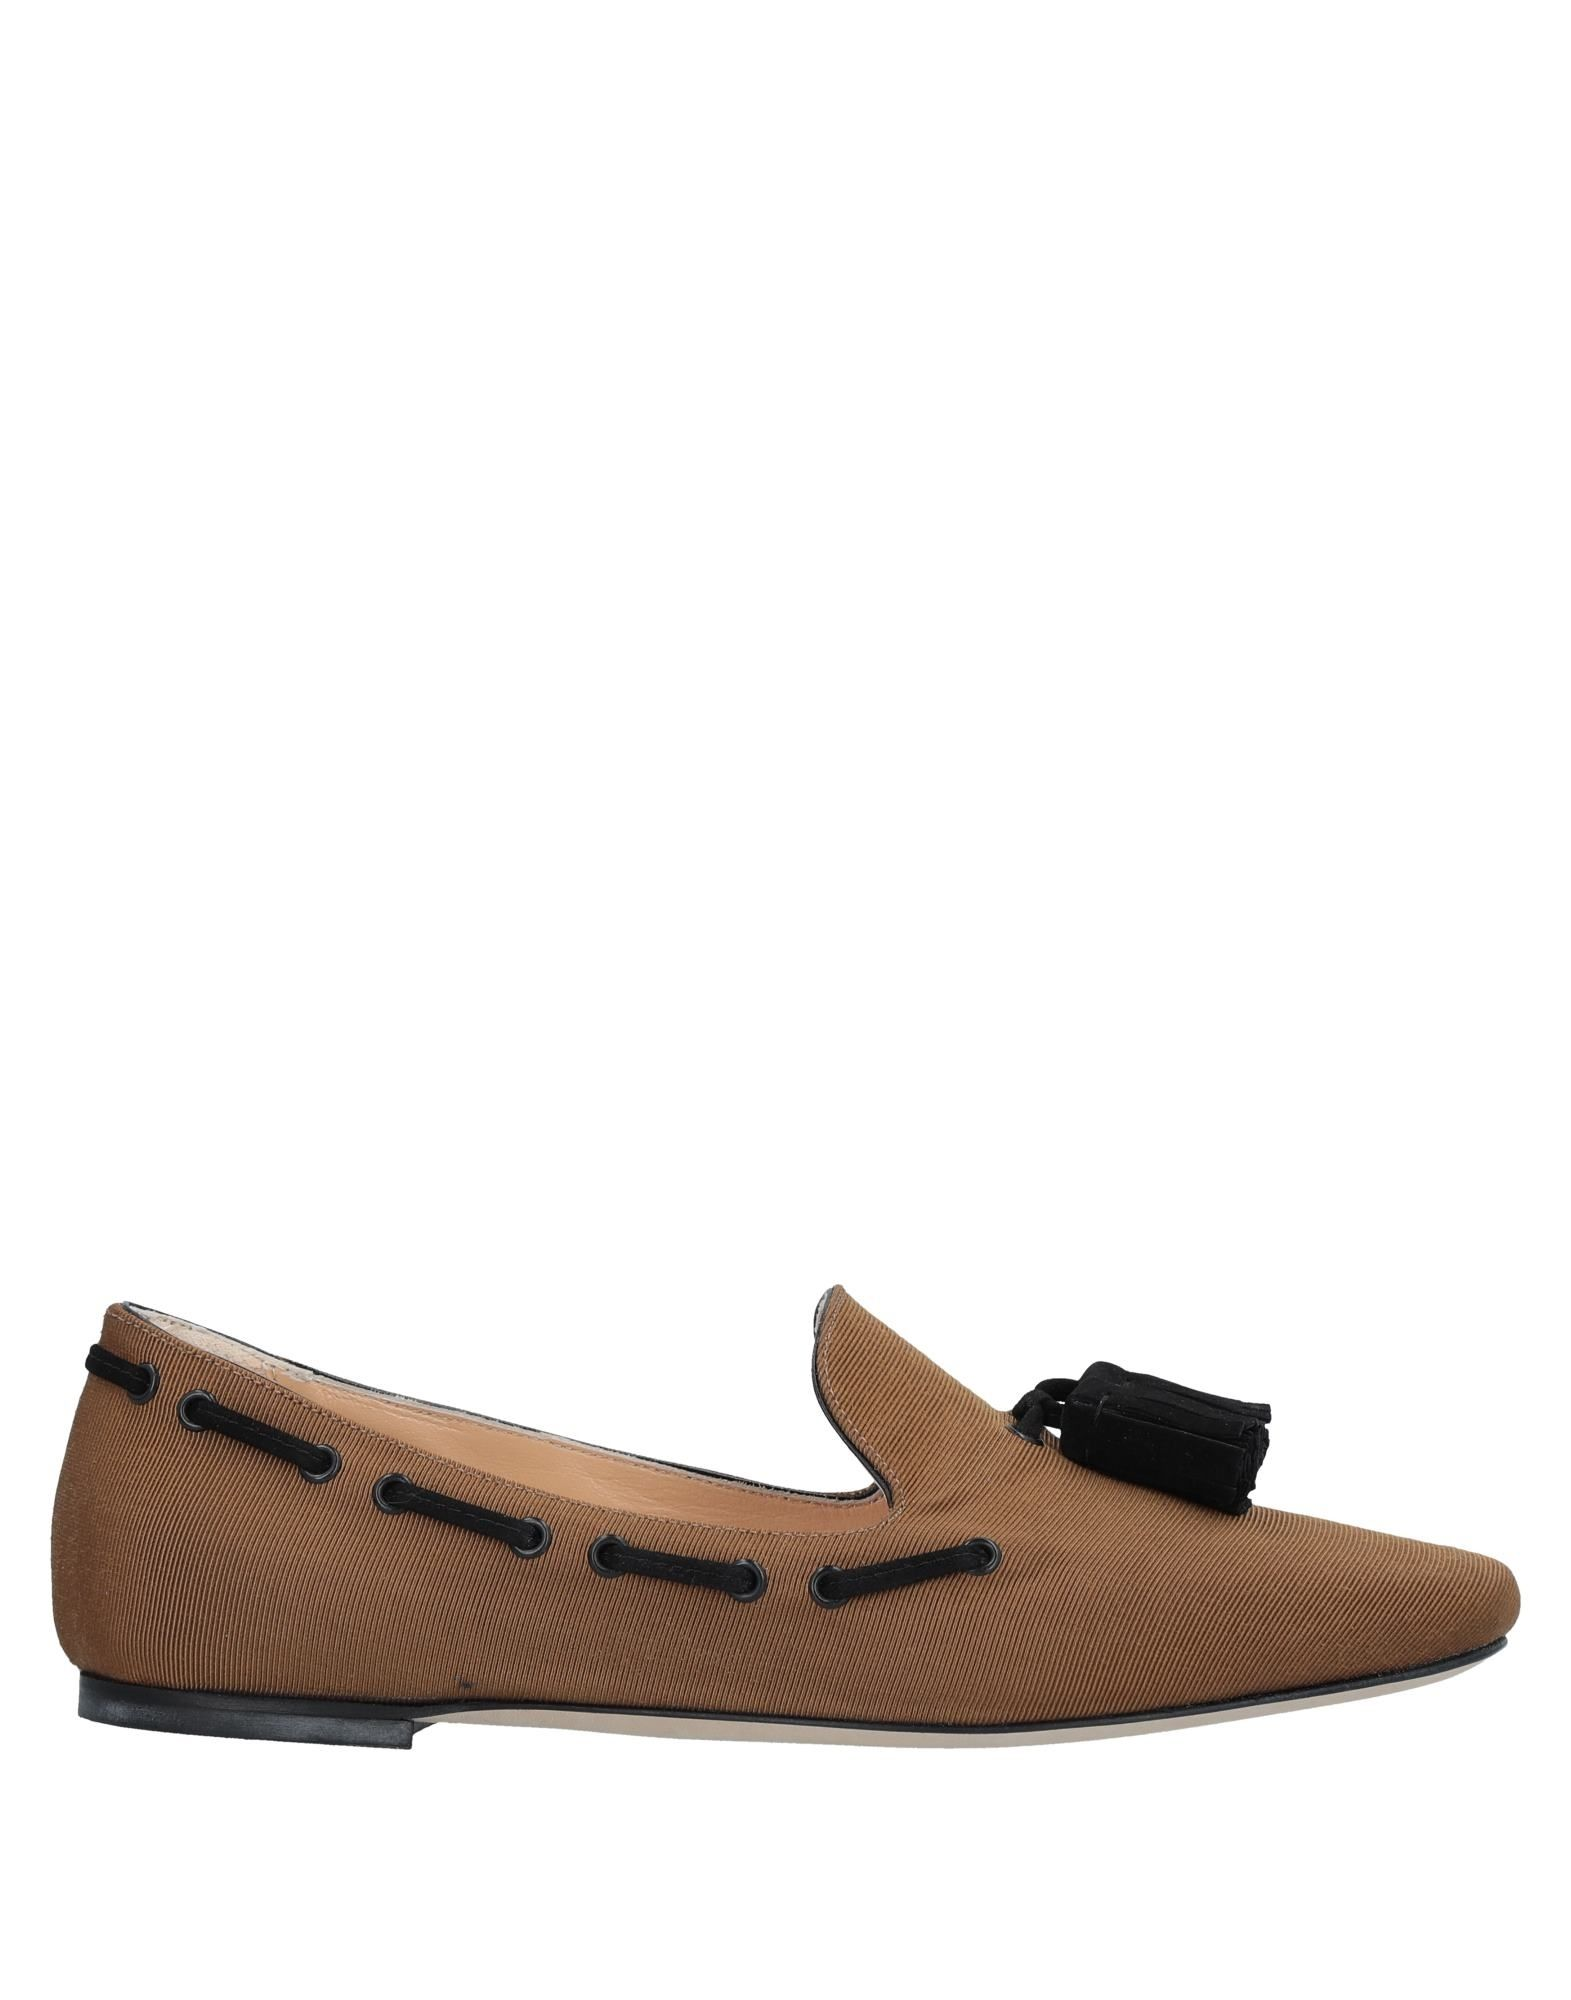 Haltbare Mode billige Schuhe Etro Mokassins Damen  11523837OB Heiße Schuhe